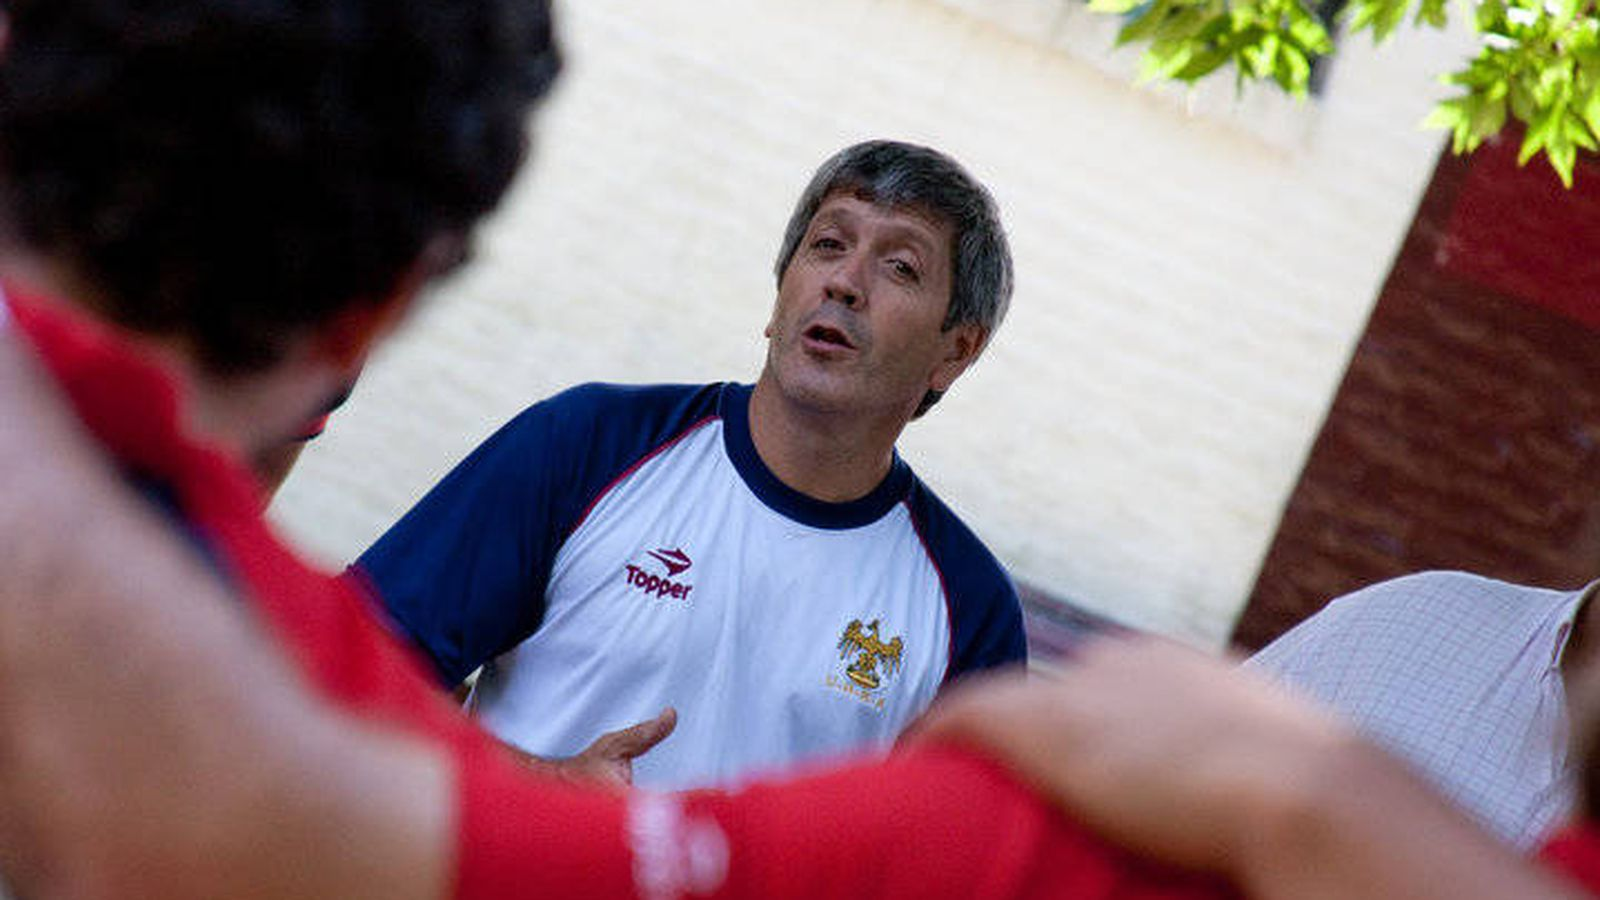 Foto: En la imagen, Mario Barandarián.